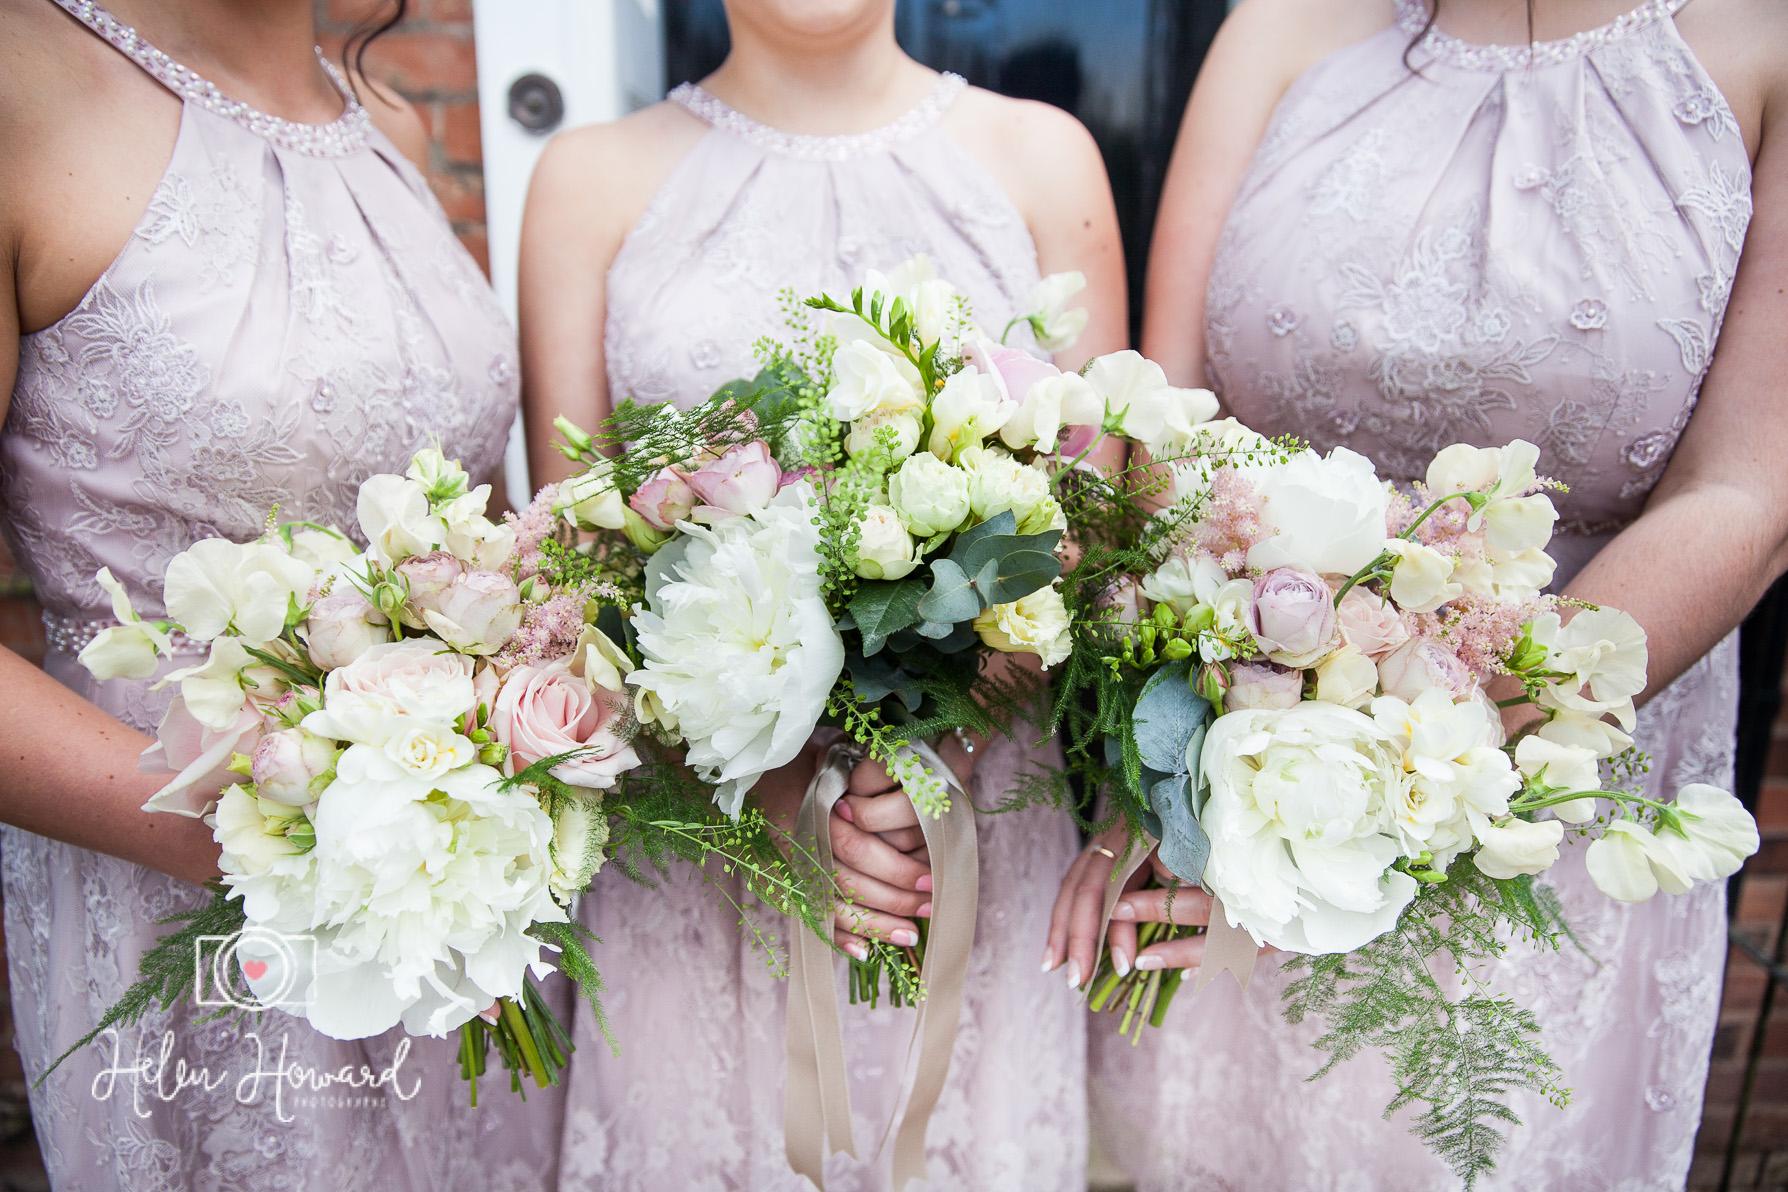 Helen Howard Photography Packington Moor Wedding-56.jpg